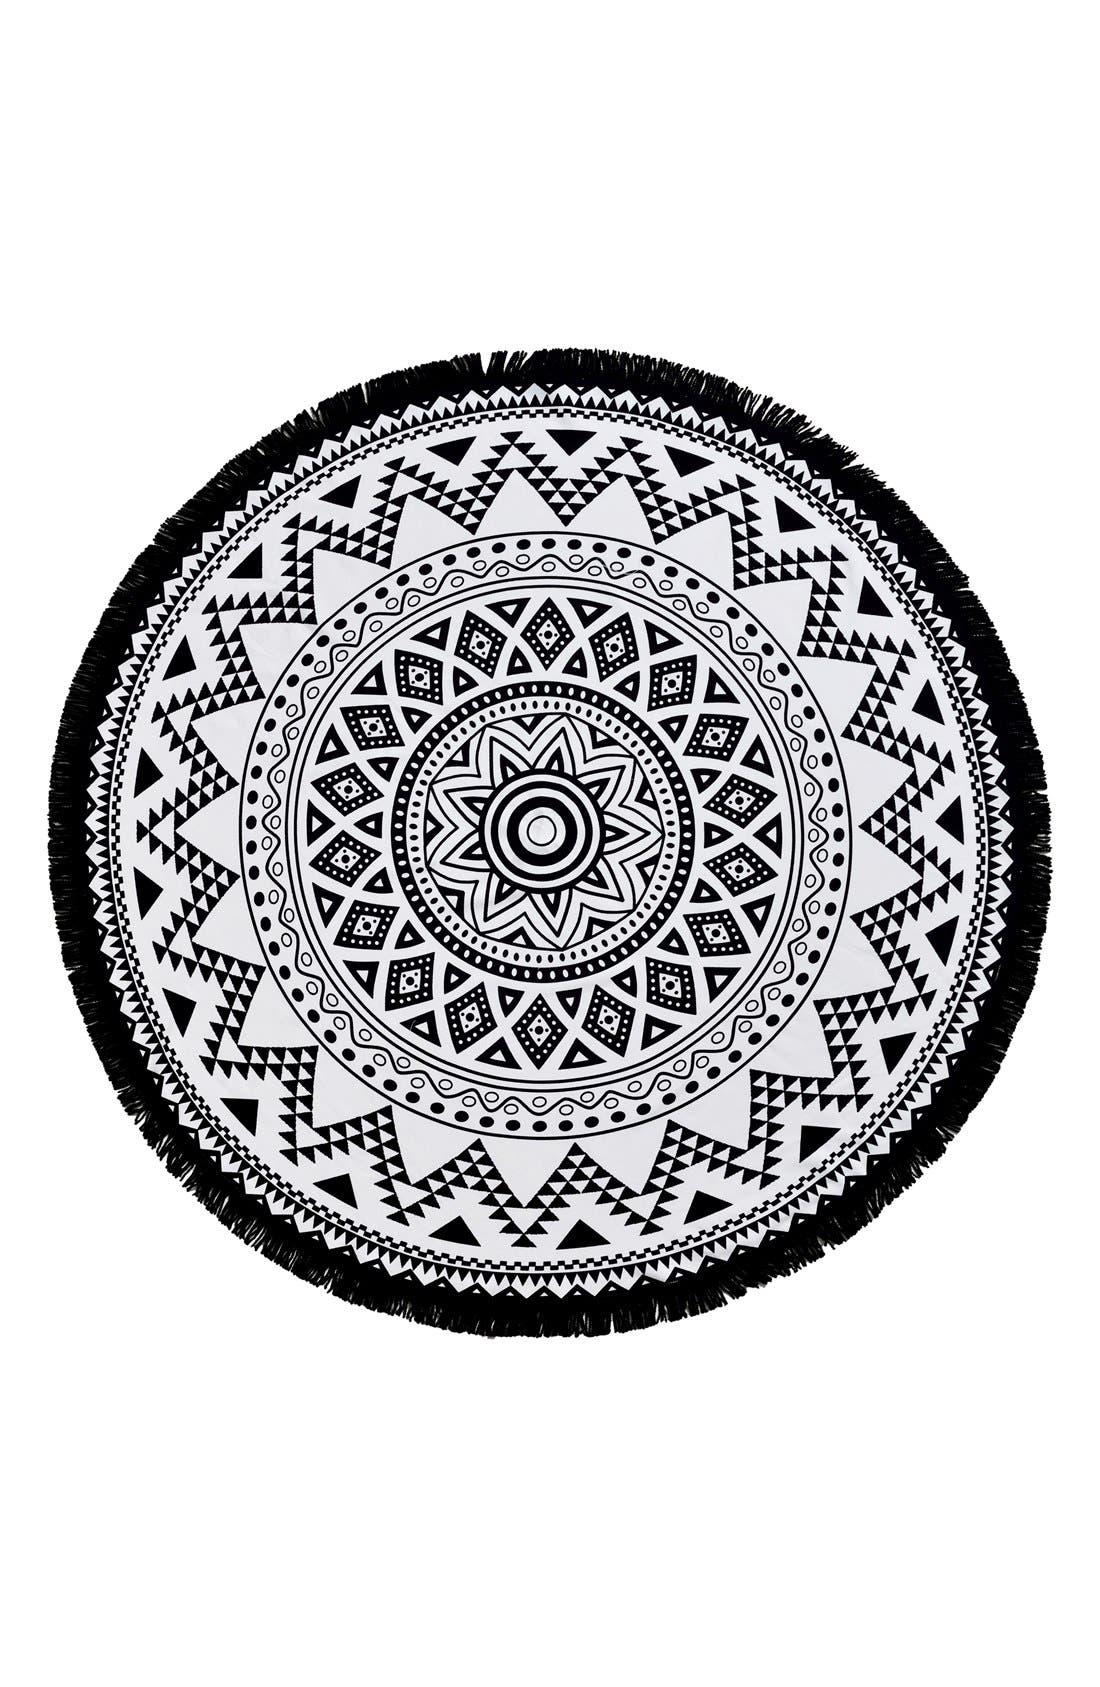 'Kilim' Turkish Pestemal Round Beach Towel,                         Main,                         color, BLACK/ WHITE